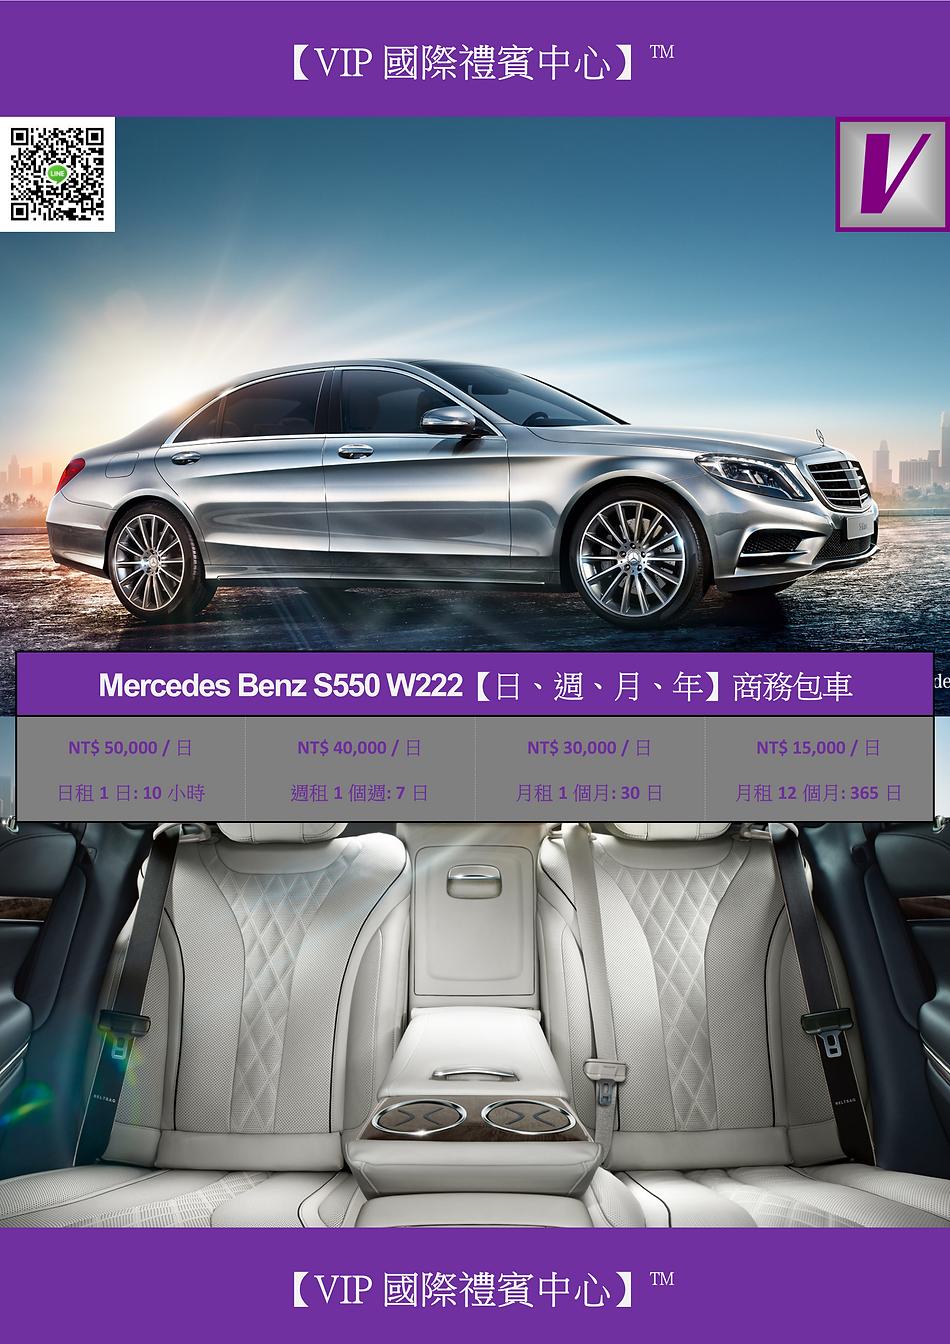 VIP國際禮賓中心 MERCEDES BENZ S550 W222 臺中市區接送包車